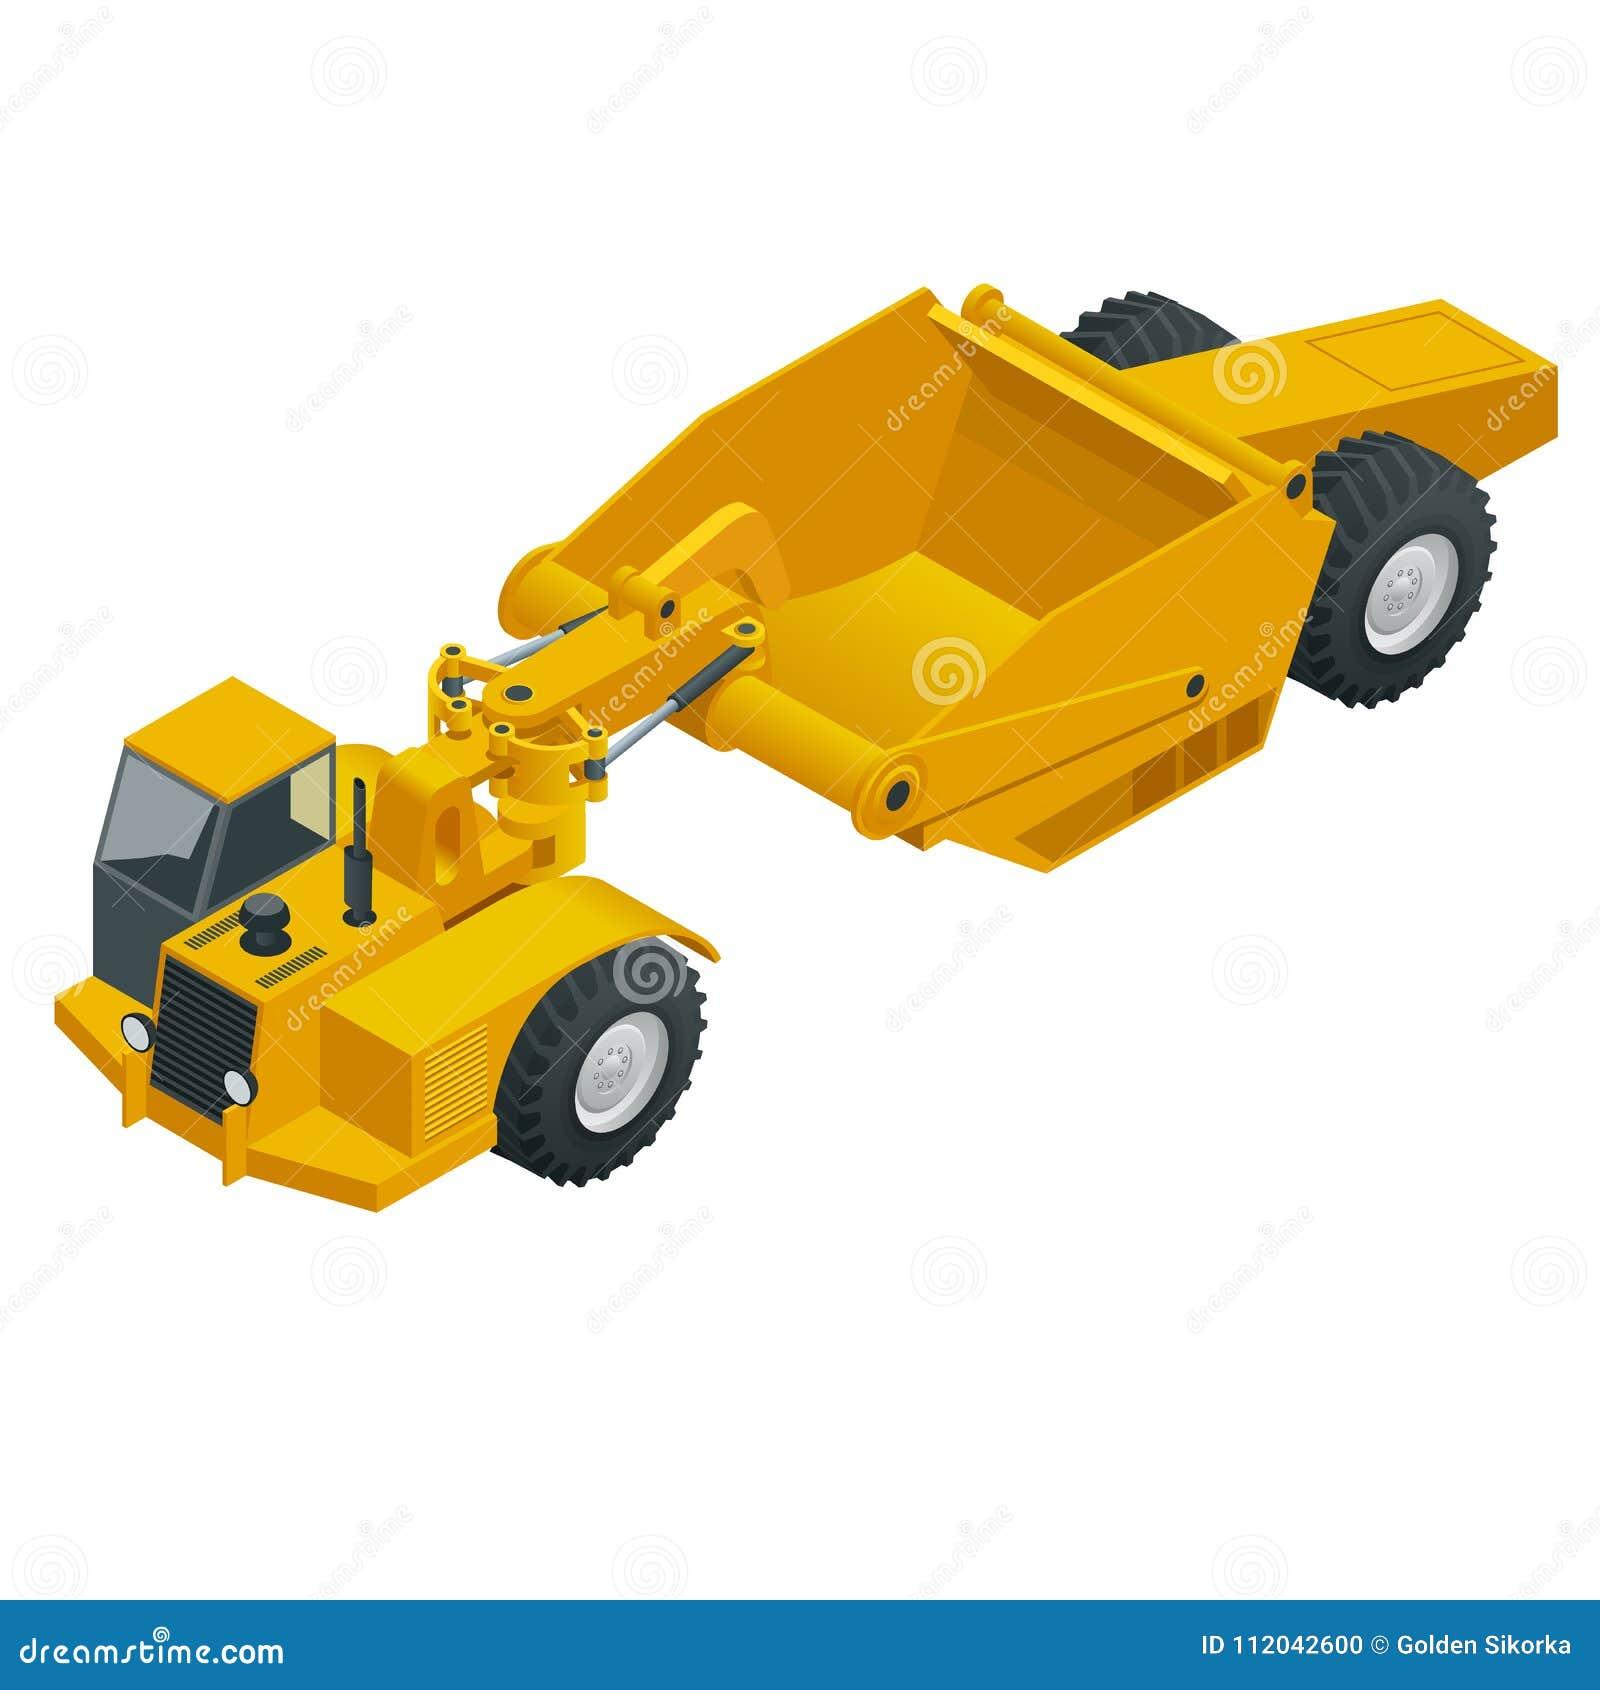 Isometric Wheel tractor-scraper. Wheel tractor-scraper, heavy equipment used for earthmoving. scraper a conveyor belt